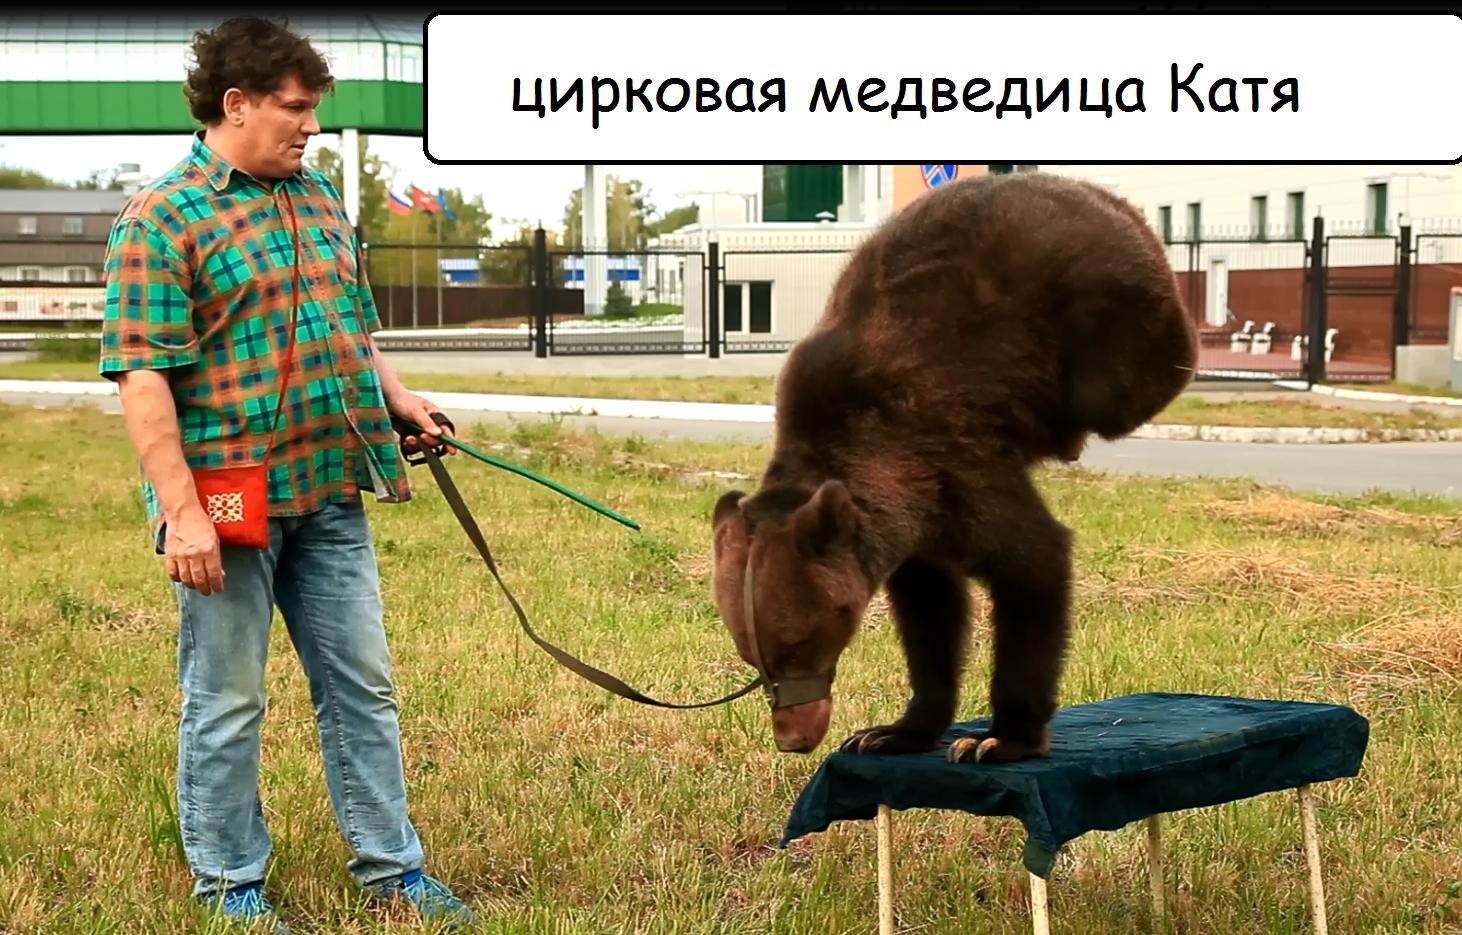 Порноактриса и цирковой медведь требуют правосудия от полиции